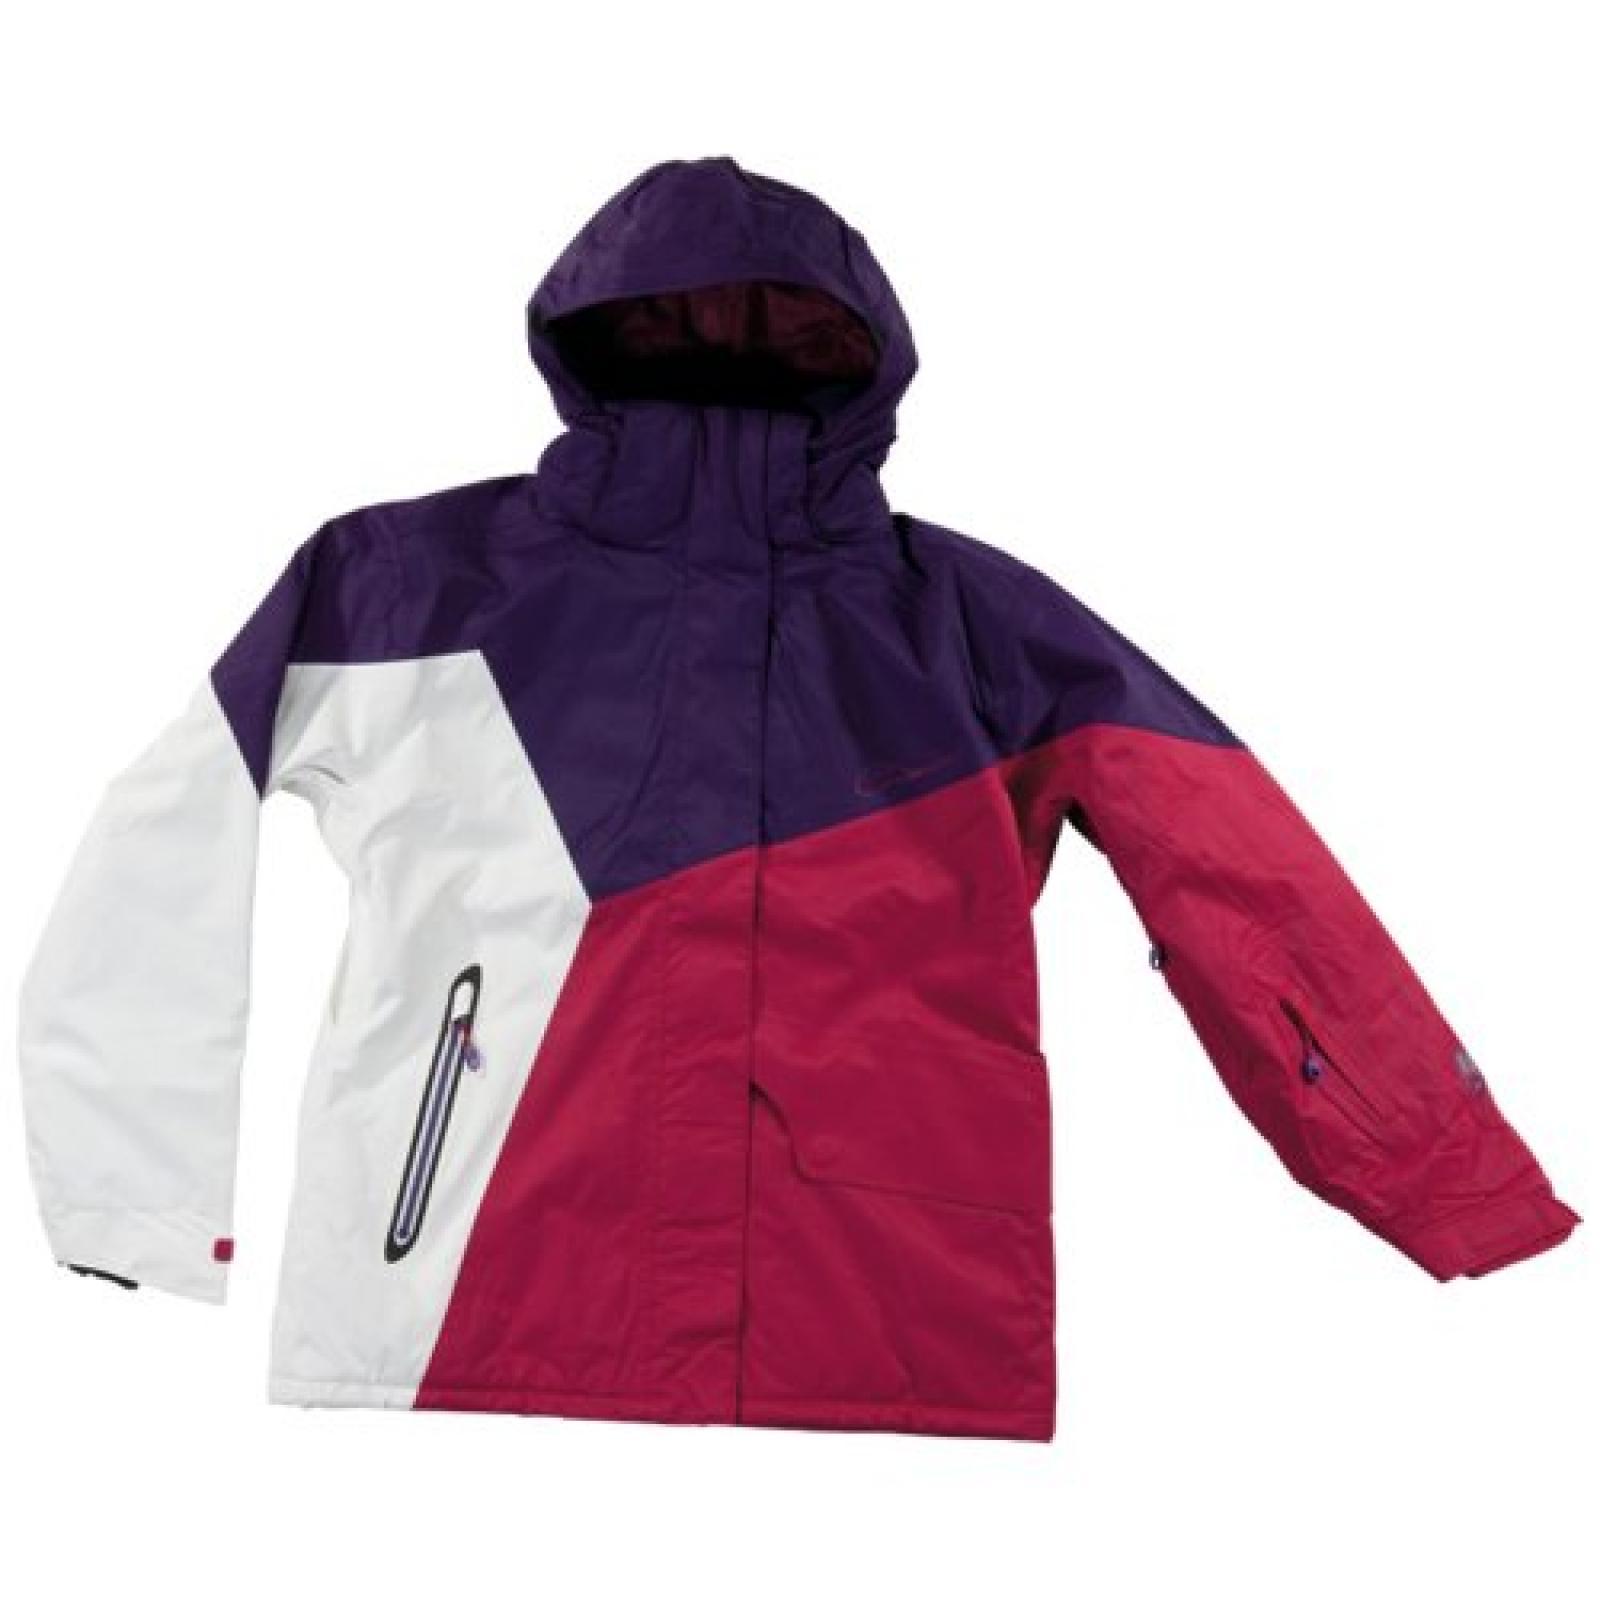 Chiemsee Damen Snowjacket ANISSA